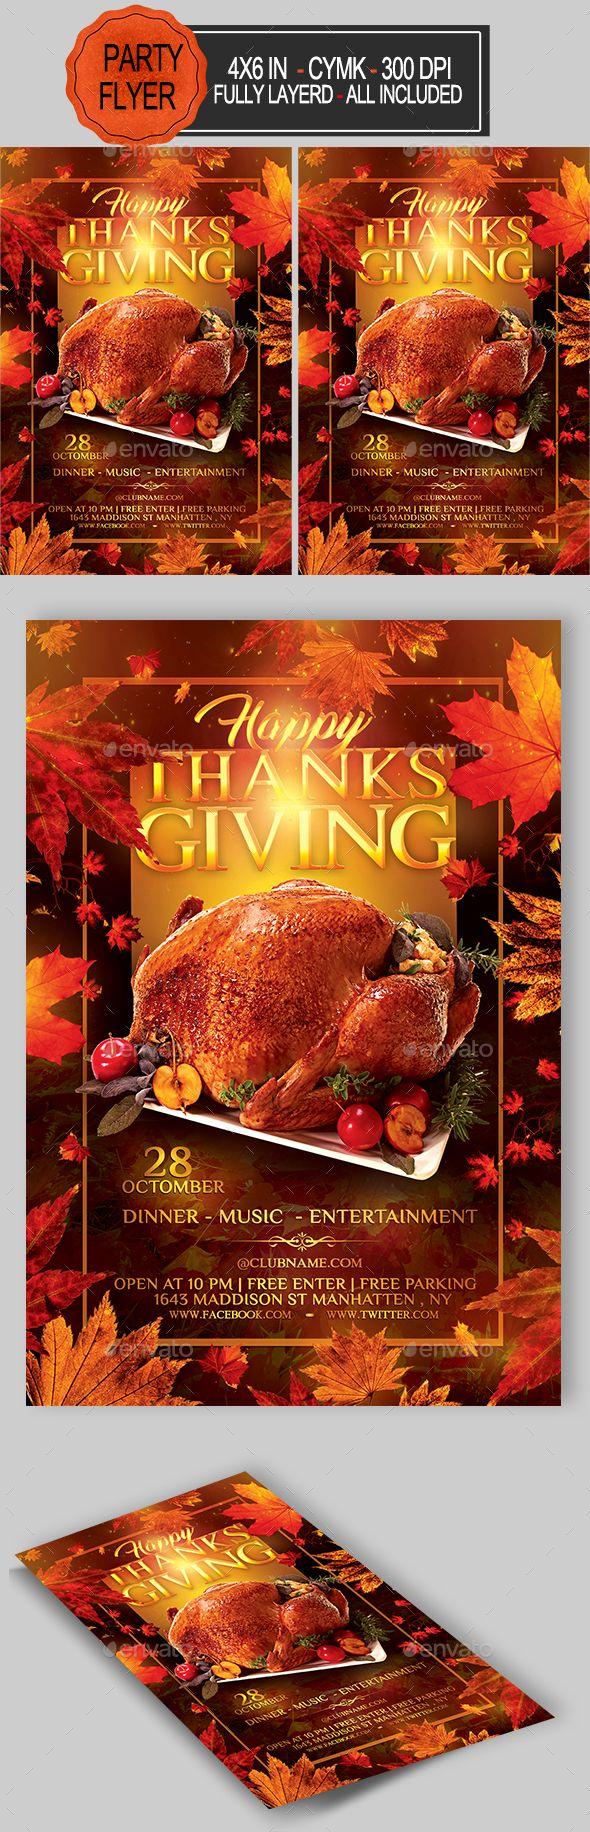 Thanksgiving Flyer Clubs Parties Events Flyer Pinterest